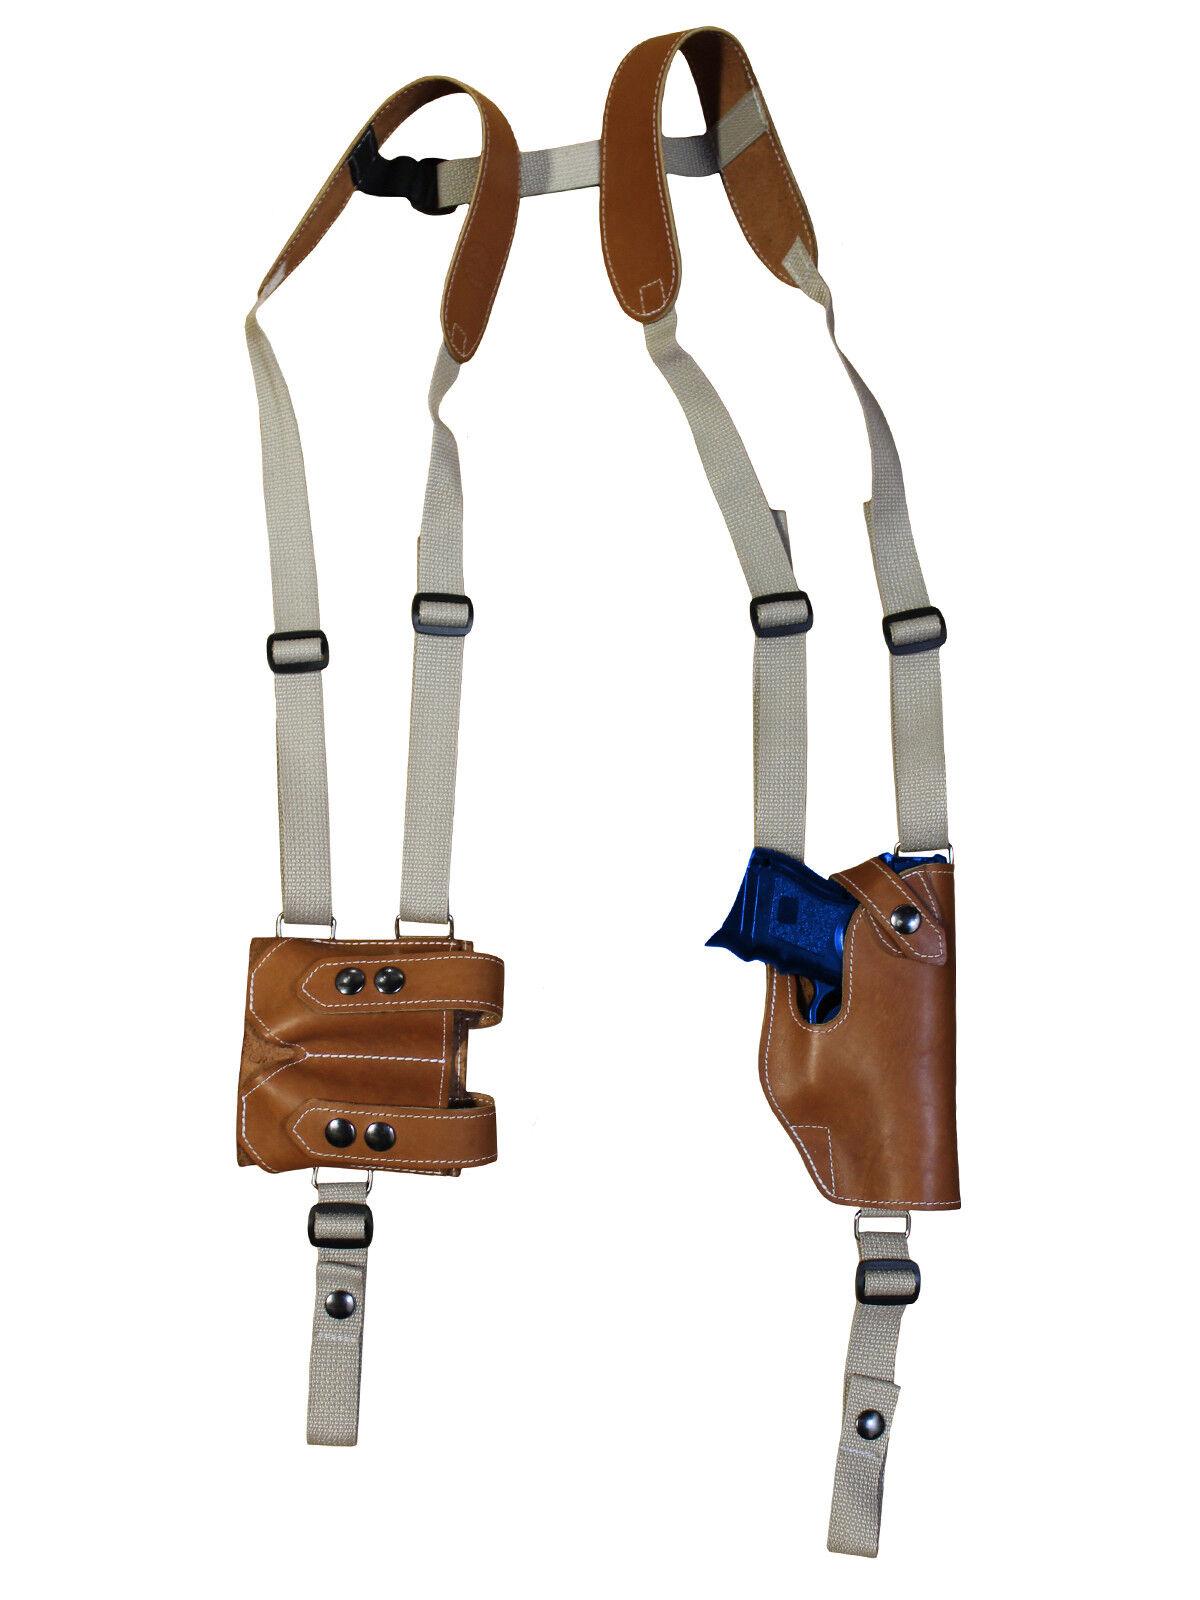 Nueva Funda de Cuero Tostado verdeical de Hombro con DBL Mag Pouch Colt Kimber Compacto